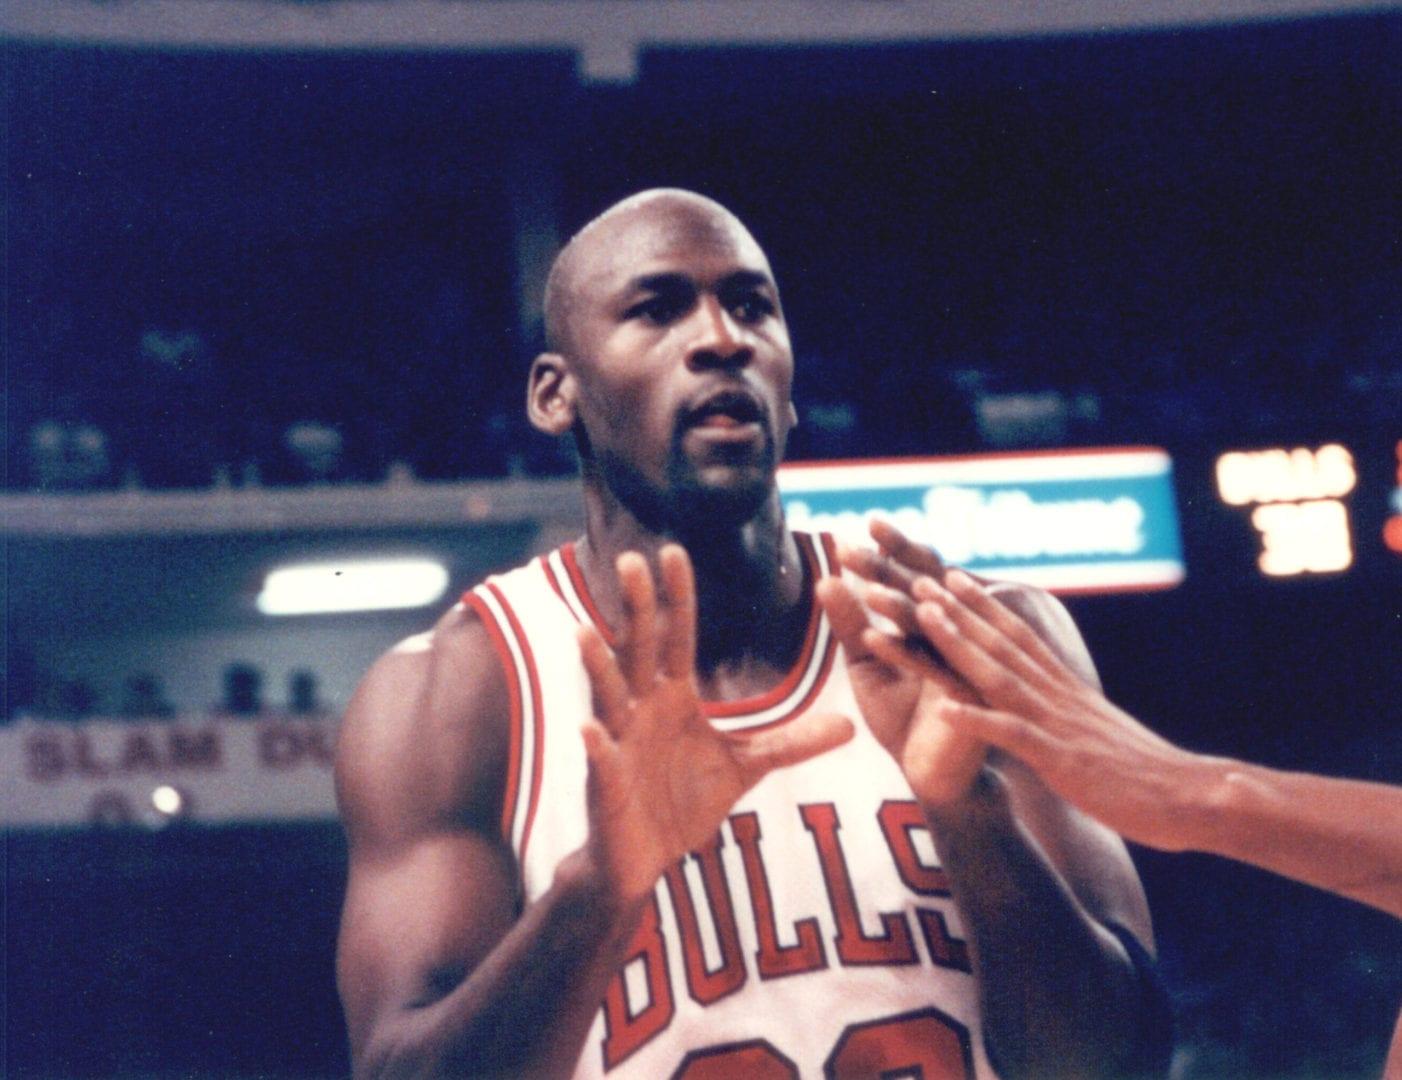 Michael Jordan ready to catch the ball